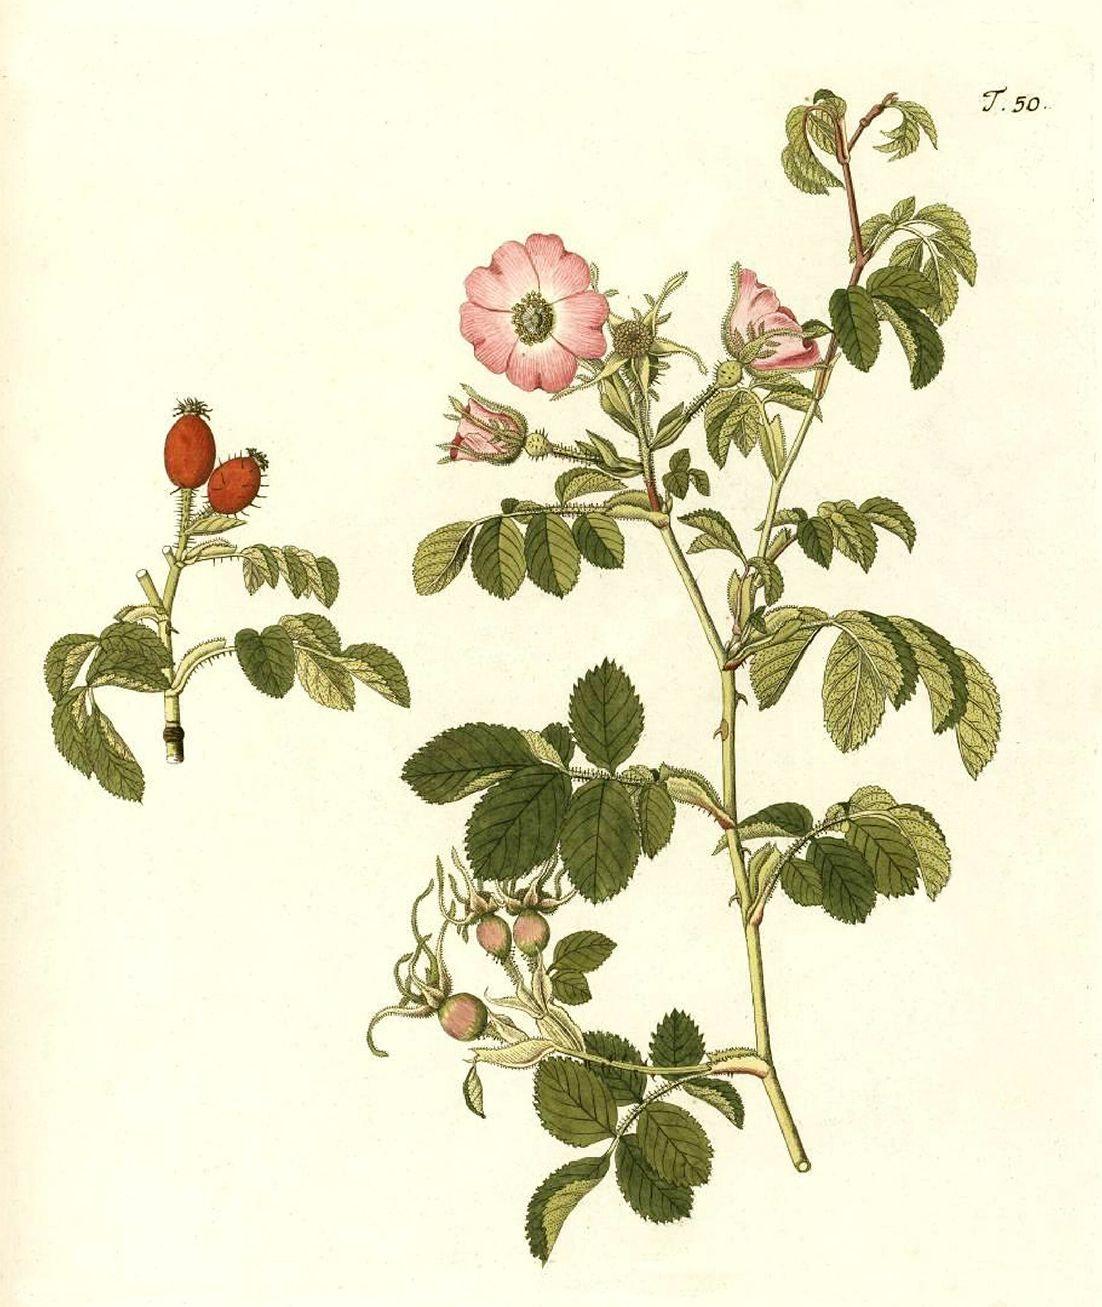 Rosa rubiginosa dans la «Flora austriaca» de Nikolaus Joseph Jacquin